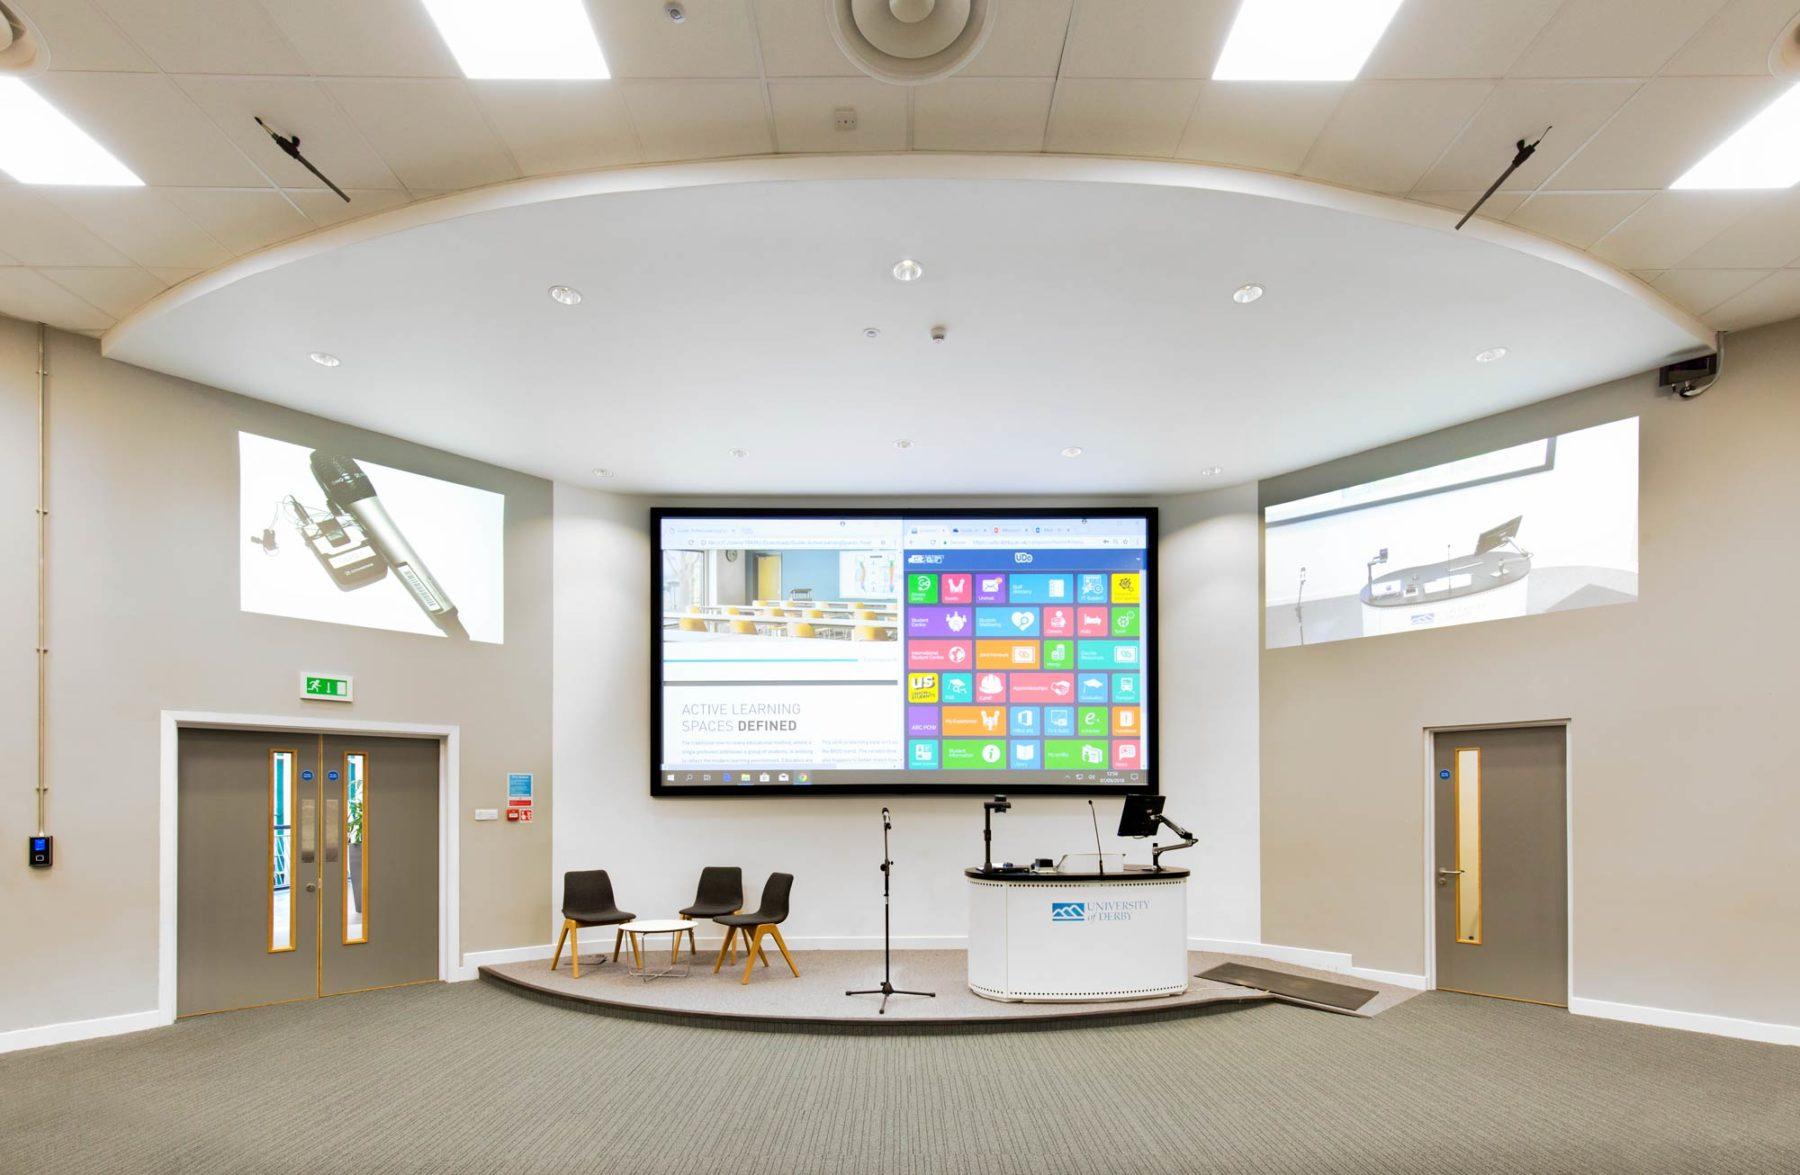 Multimedia interior showing huge viewing screen and lectern by interior photographer Matthew Jones